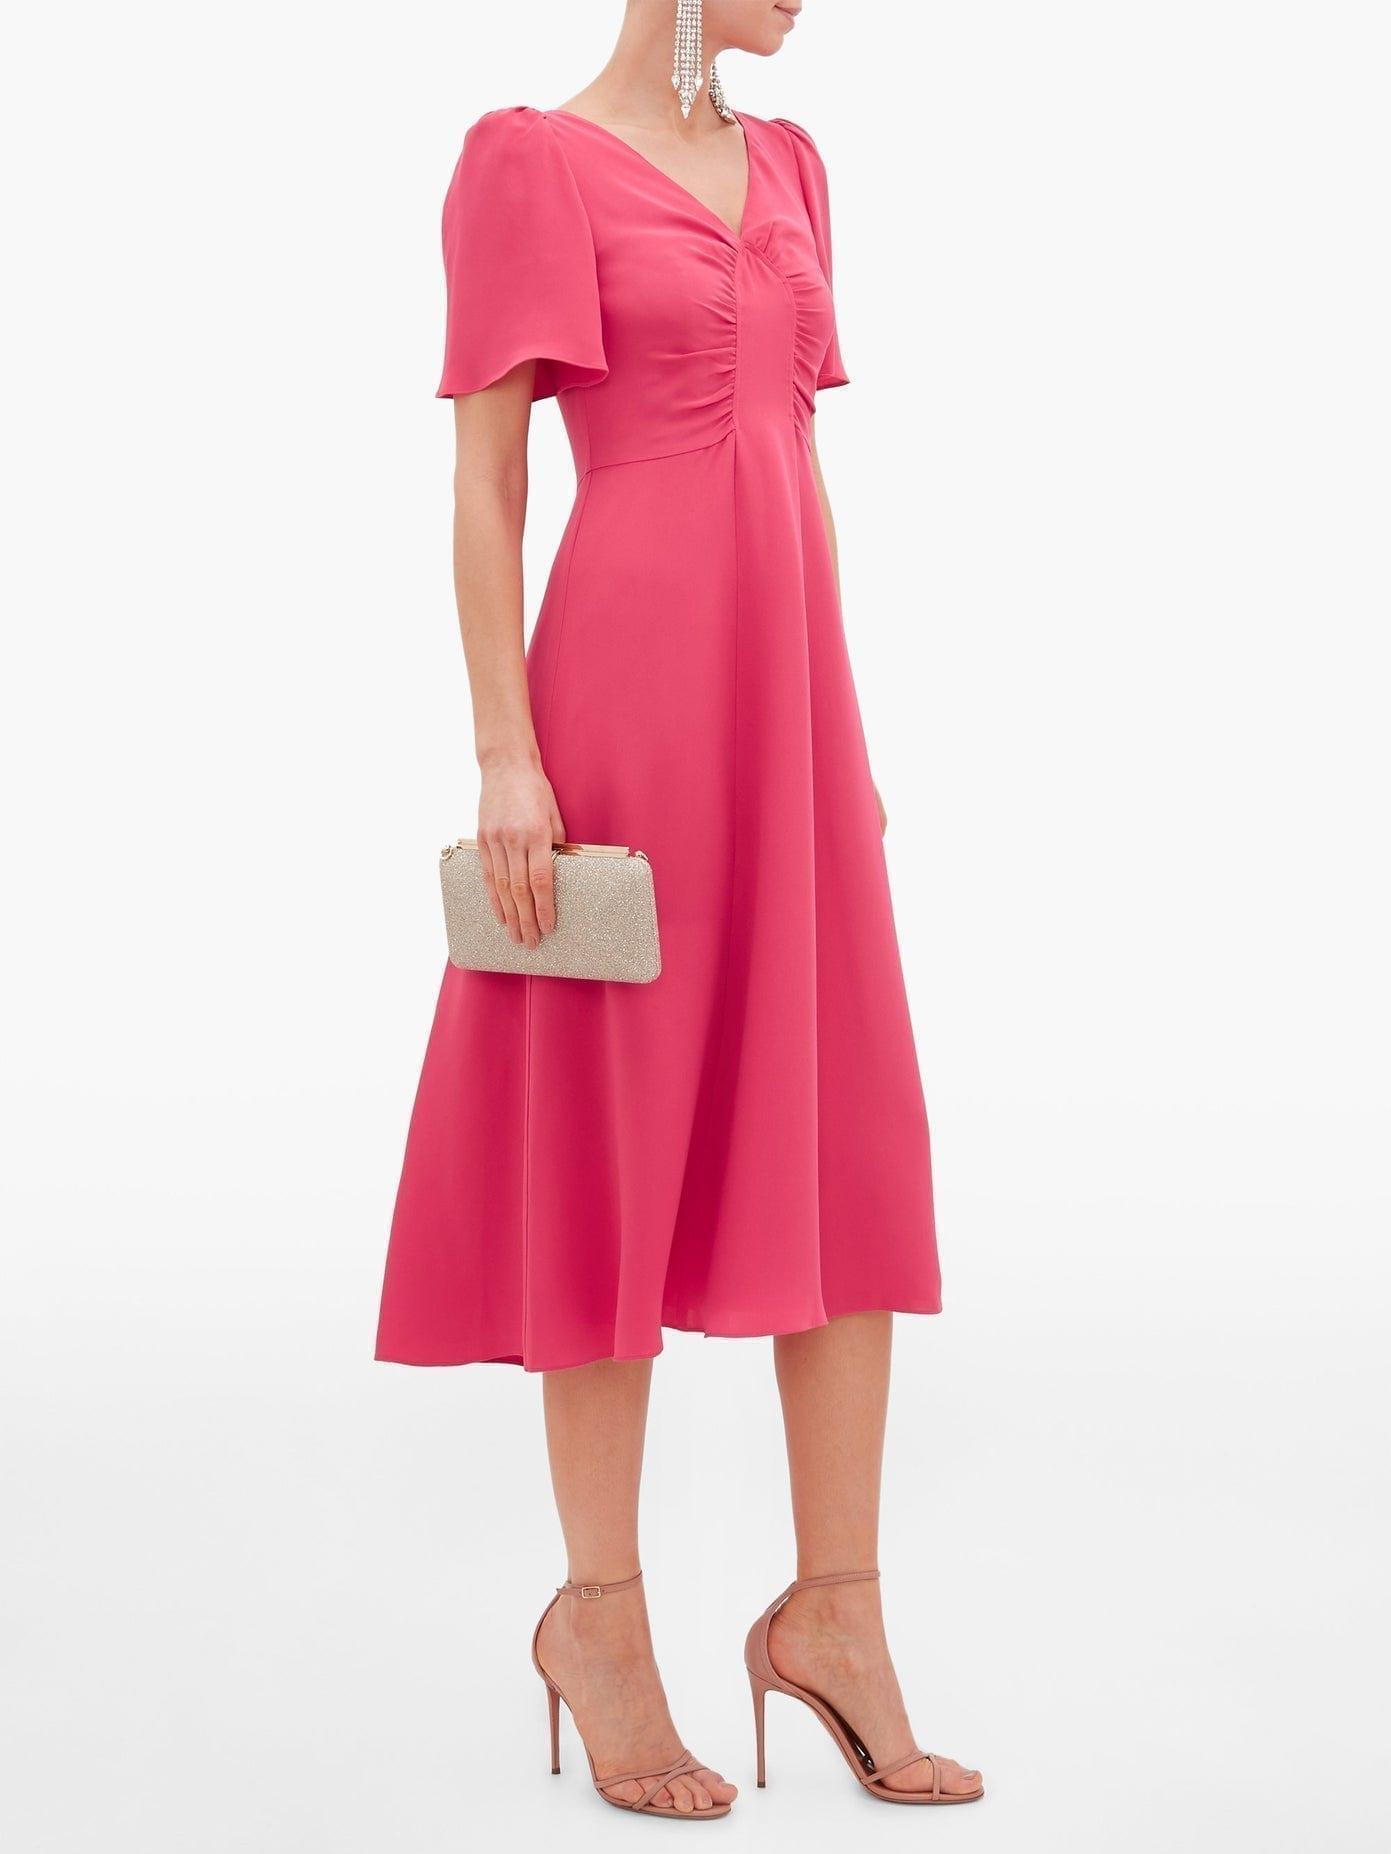 GOAT Rosemary Gathered Silk Dress